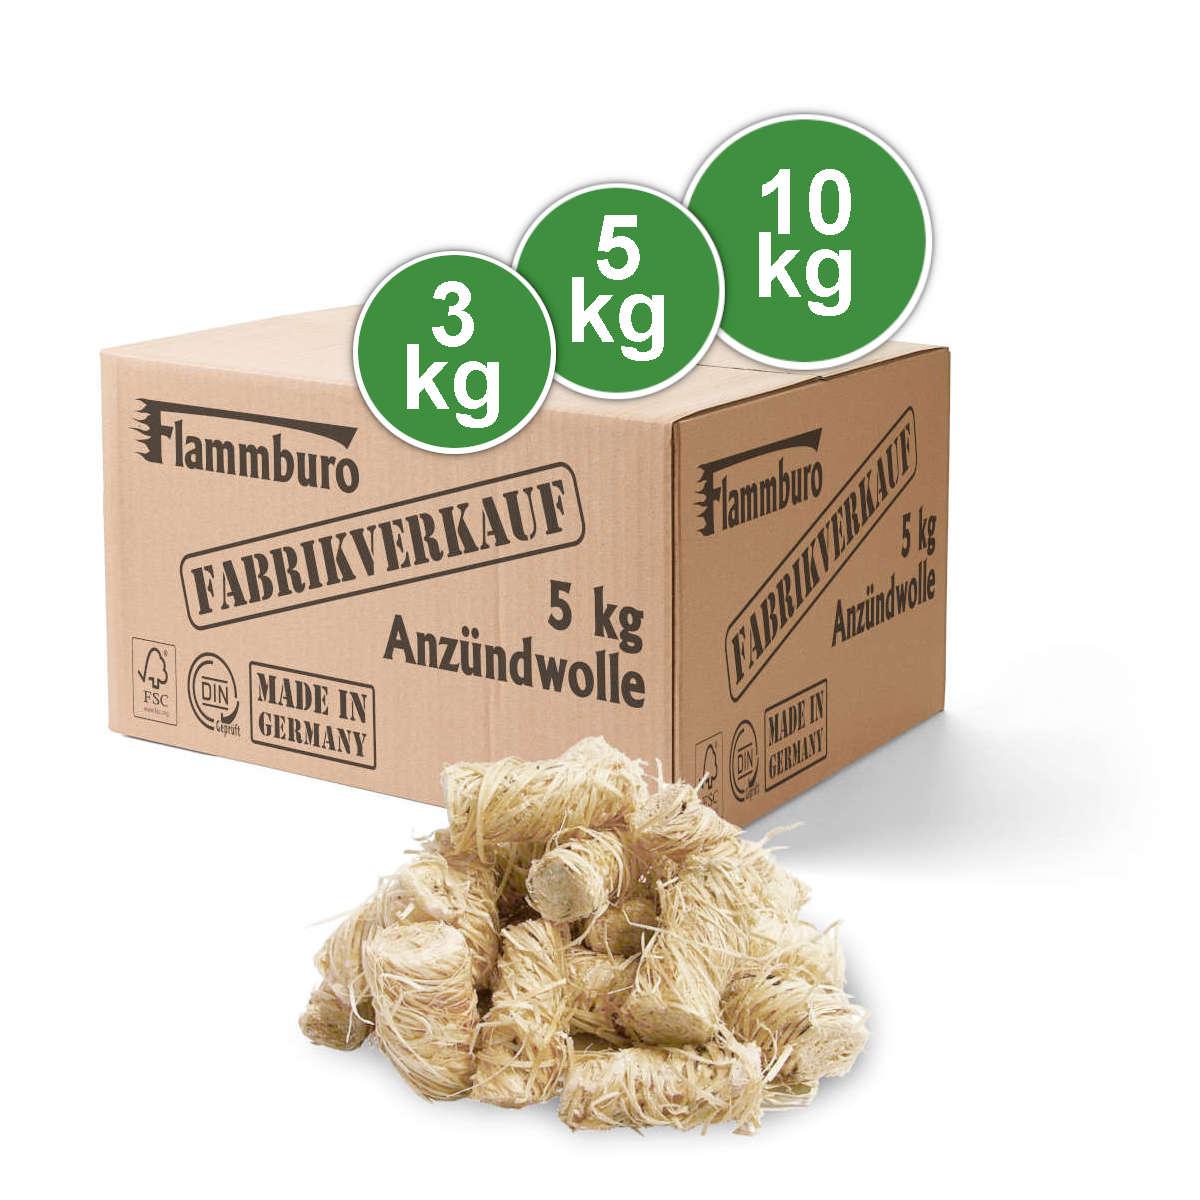 FLAMMBURO Anzündwolle 3kg 5kg 10kg